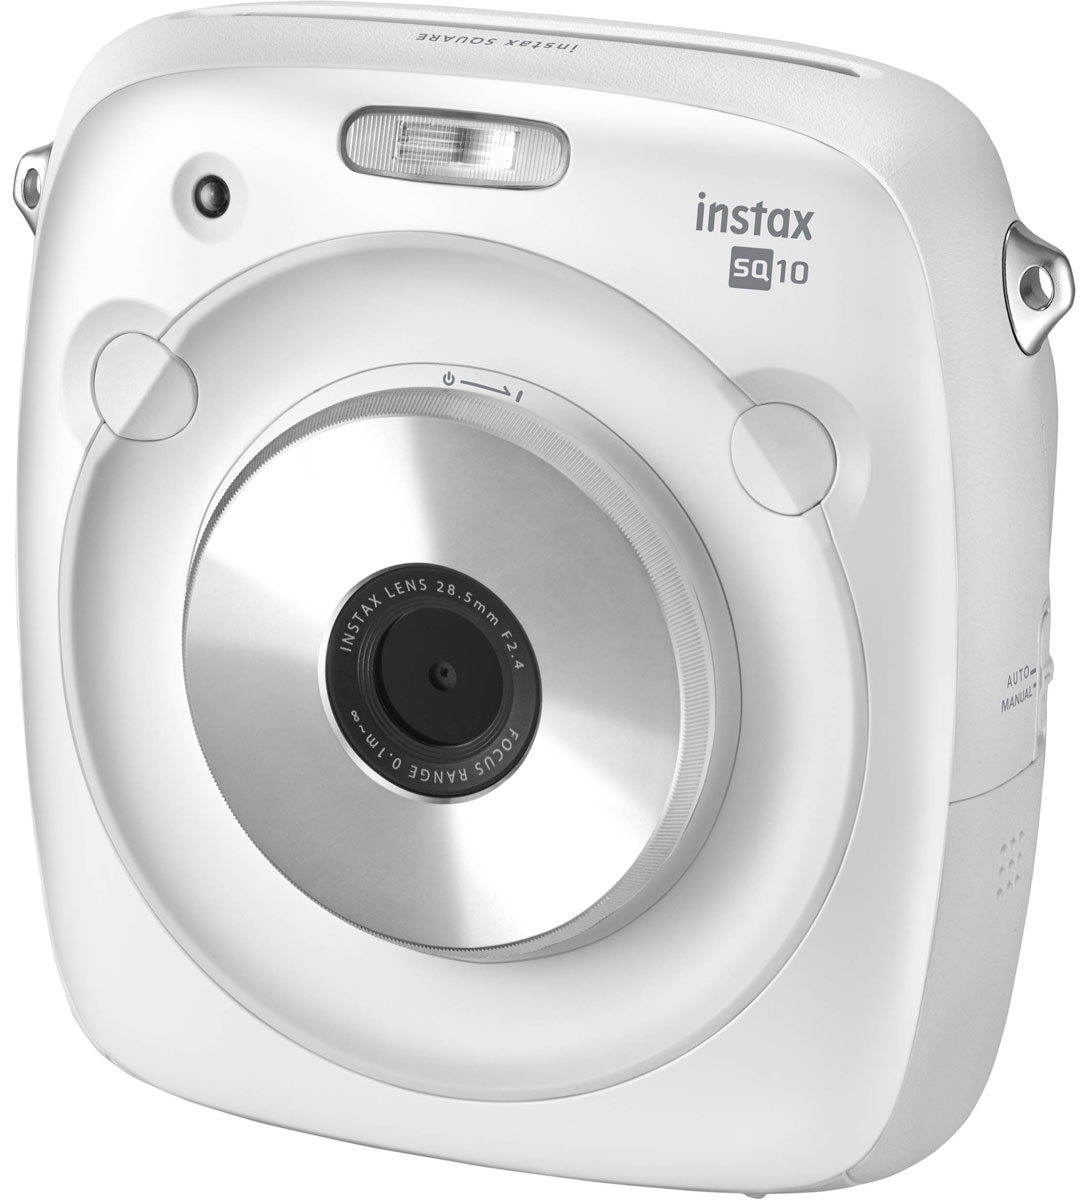 Fujifilm Instax Square 10, White фотокамера мгновенной печати фотопленка fujifilm wide glossy для instax 300 210 glossy 10 2pk на 20 фотографий